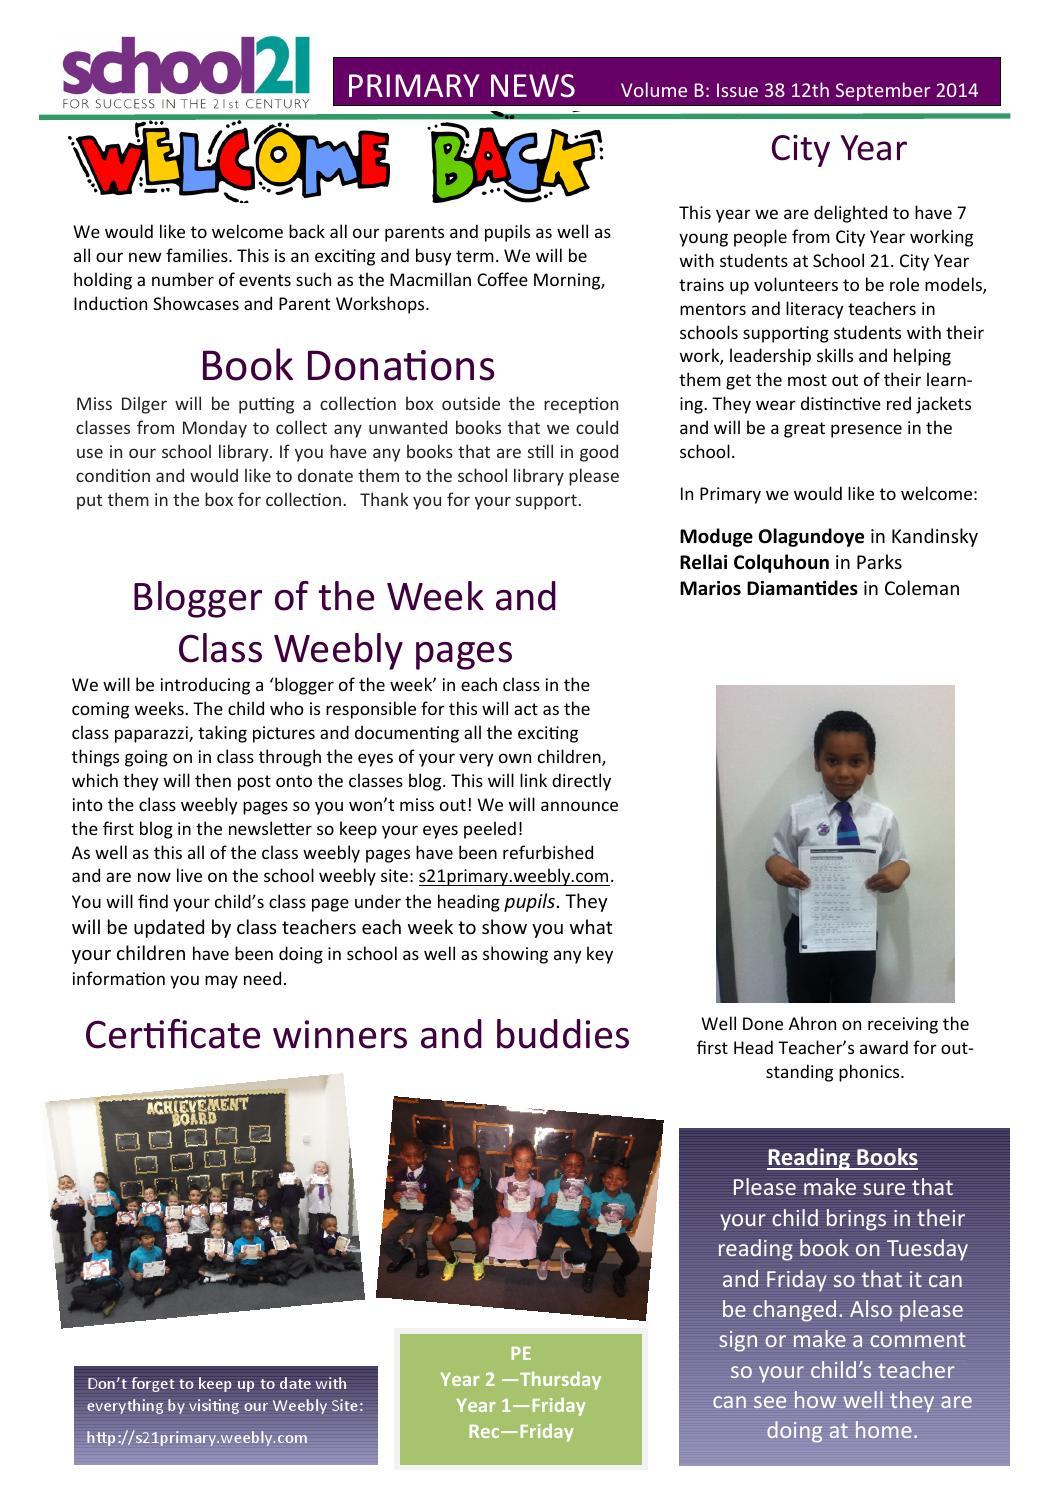 37 primary newsletter 11 07 14 ( 2) (1) by School 21 - issuu